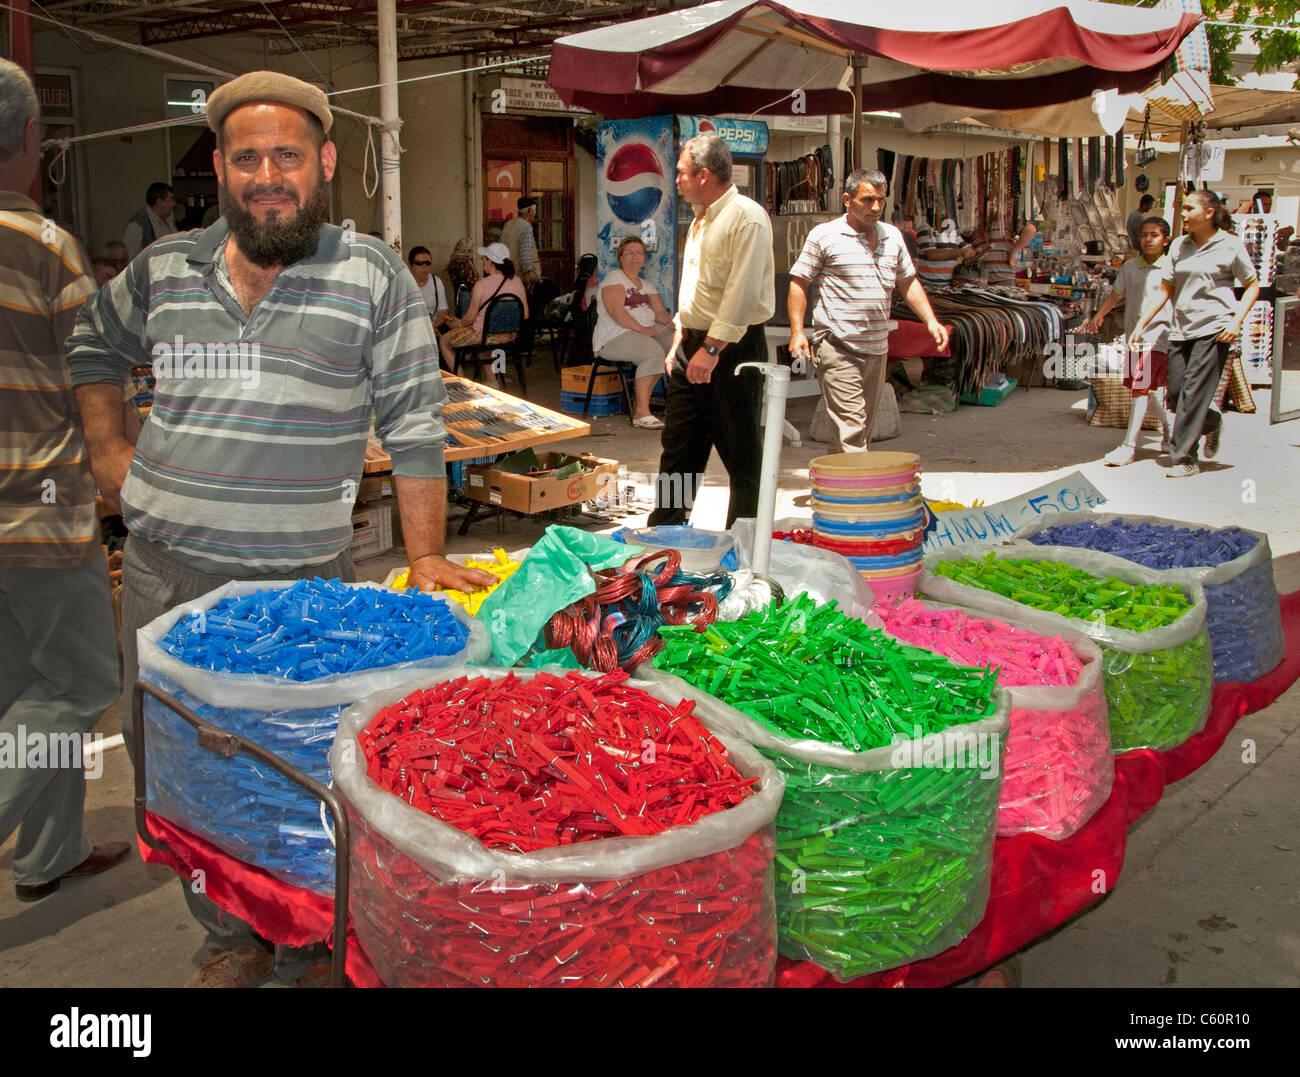 Clip Ayavalik tronchese Market Bazar turco Turchia Immagini Stock